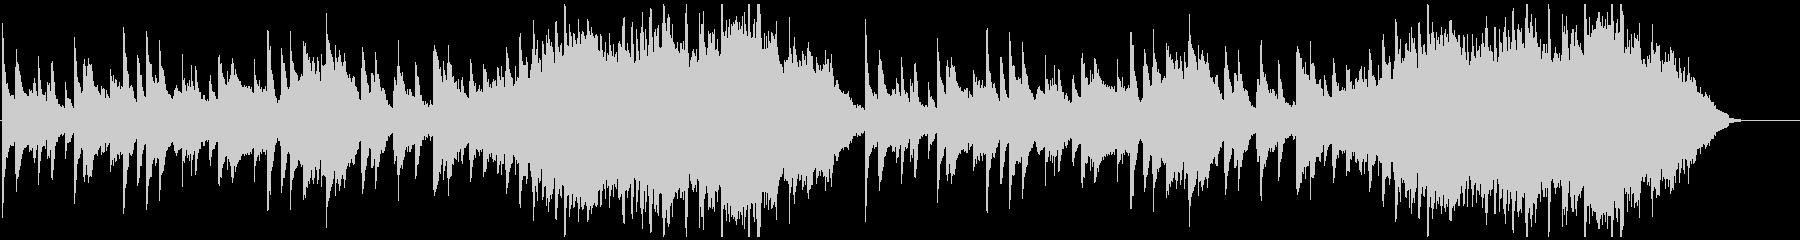 Moist piano, strings BGM's unreproduced waveform